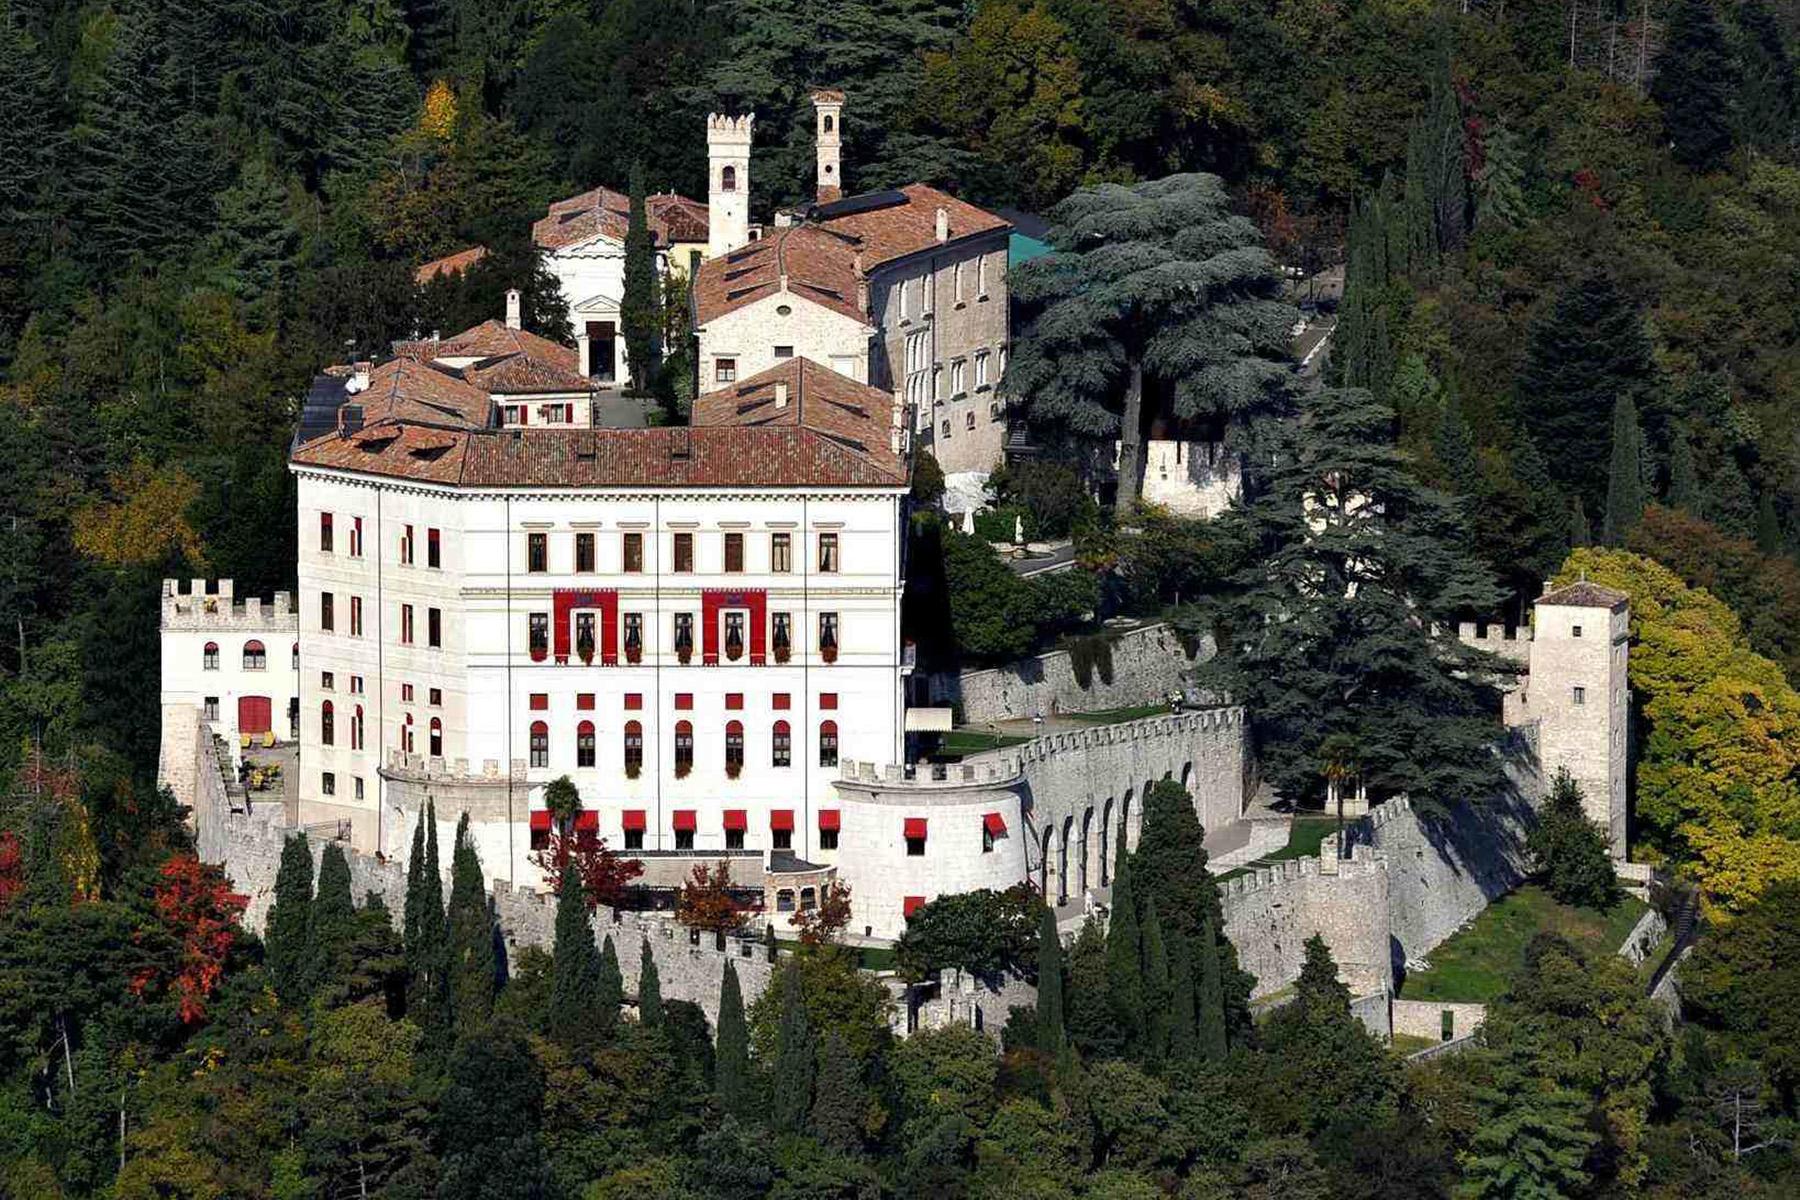 Castelbrando, Italy